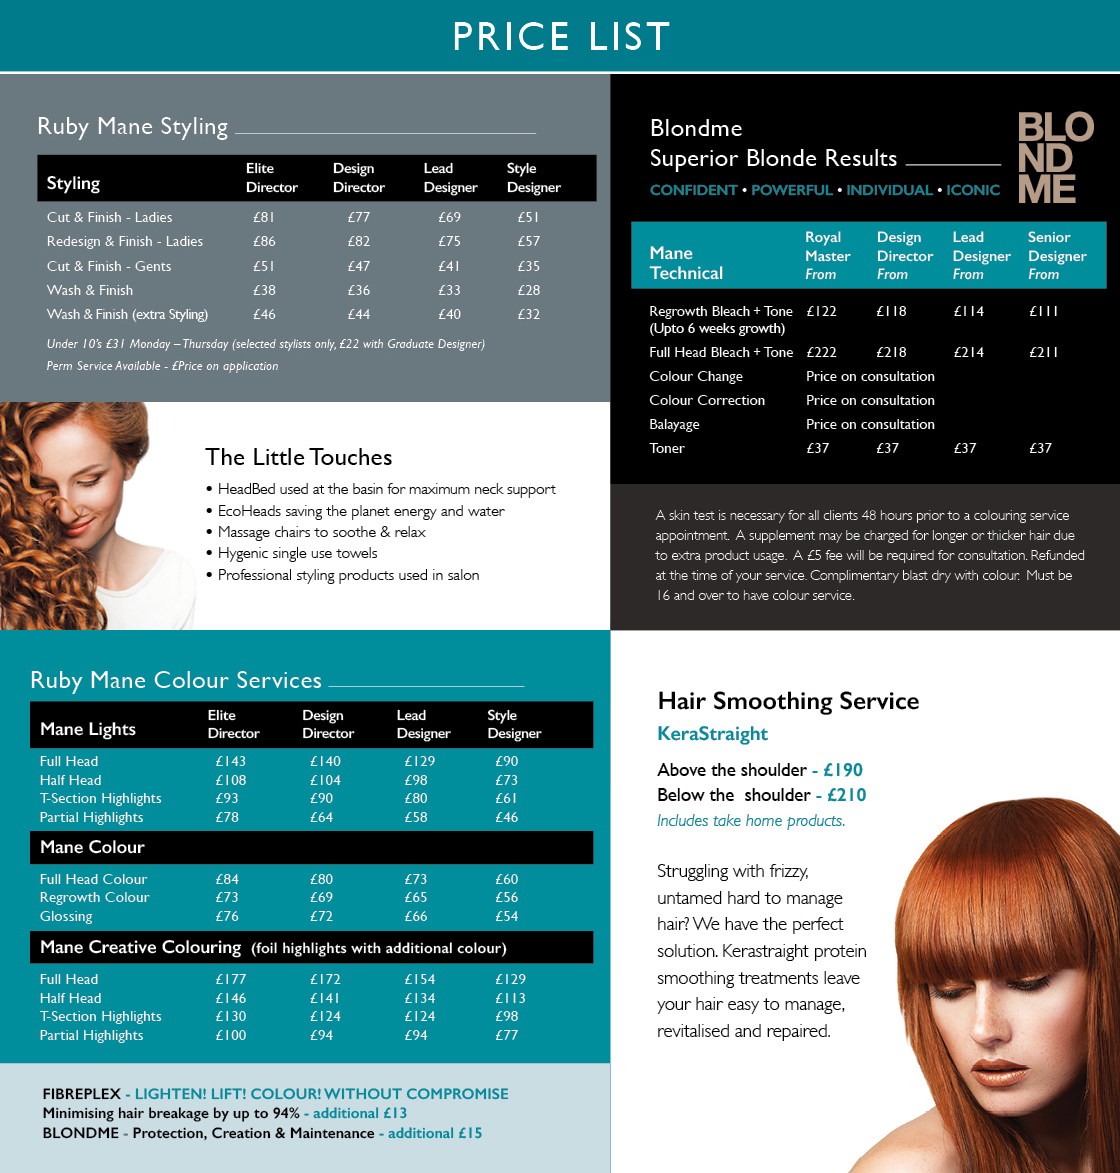 Ruby Mane Price List